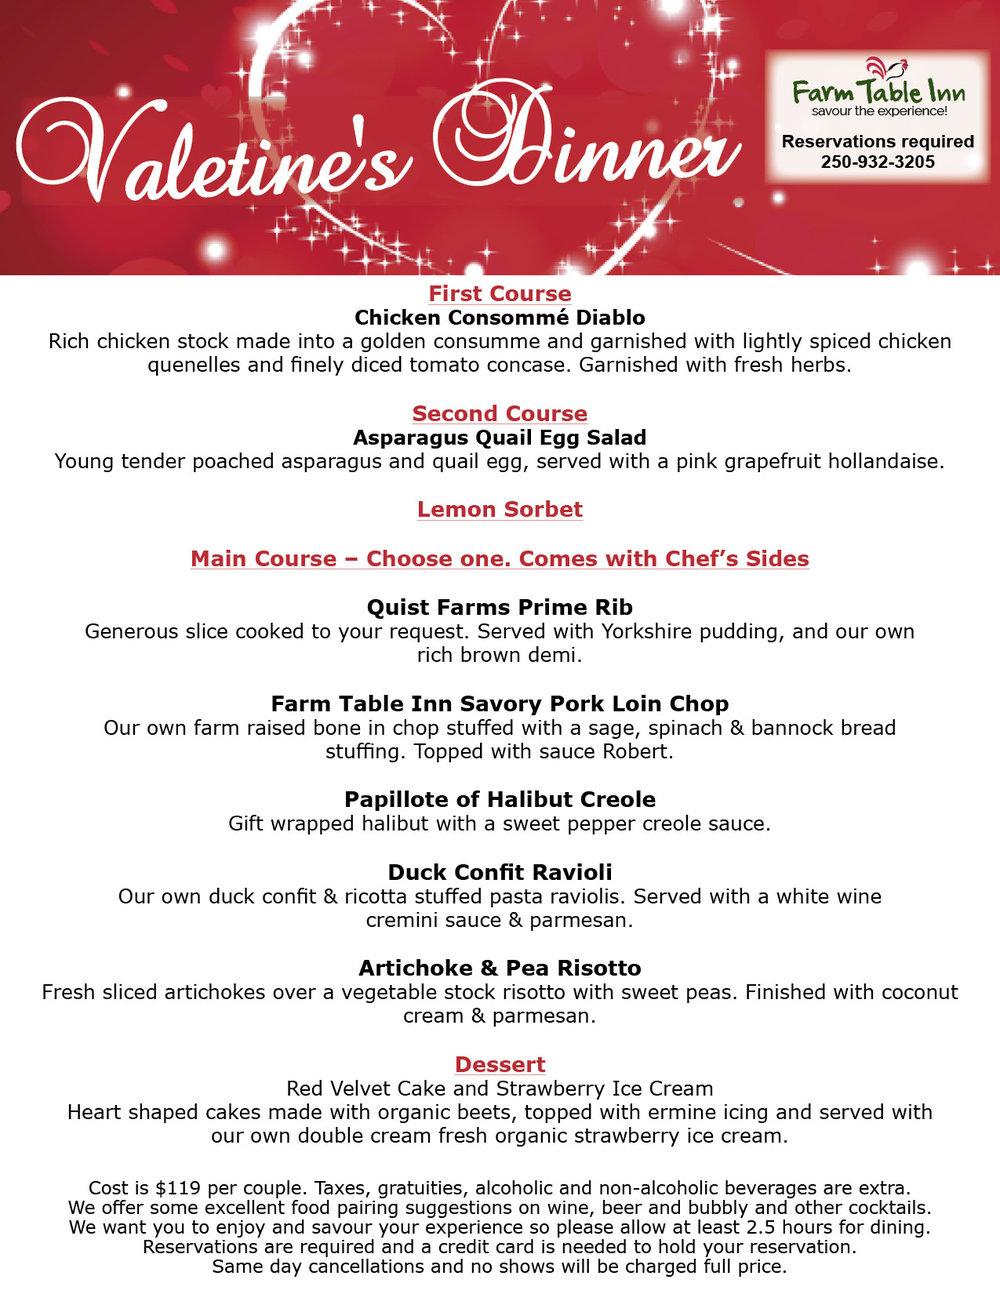 Farm Table Inn Valetine's Dinner 2018.jpg